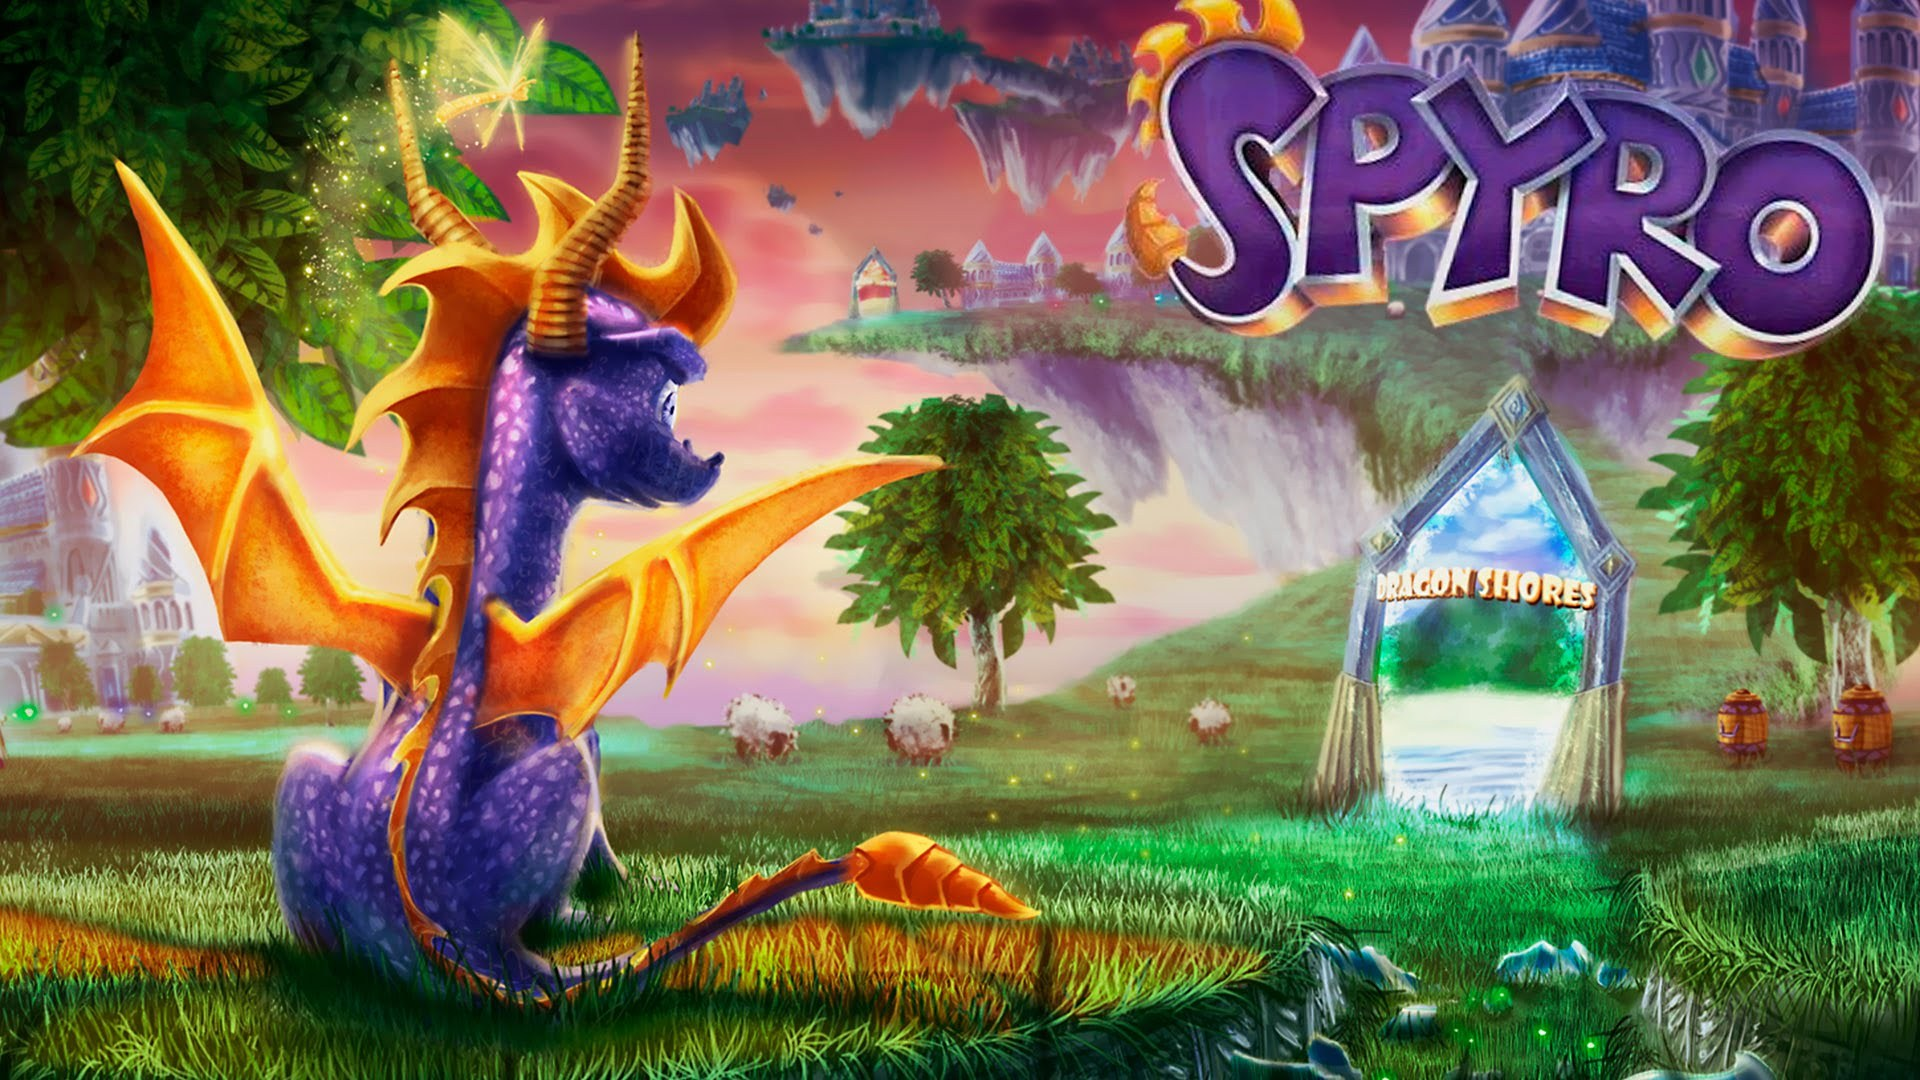 Save spyro reignited trilogy hd wallpapers read games - Spyro wallpaper ...